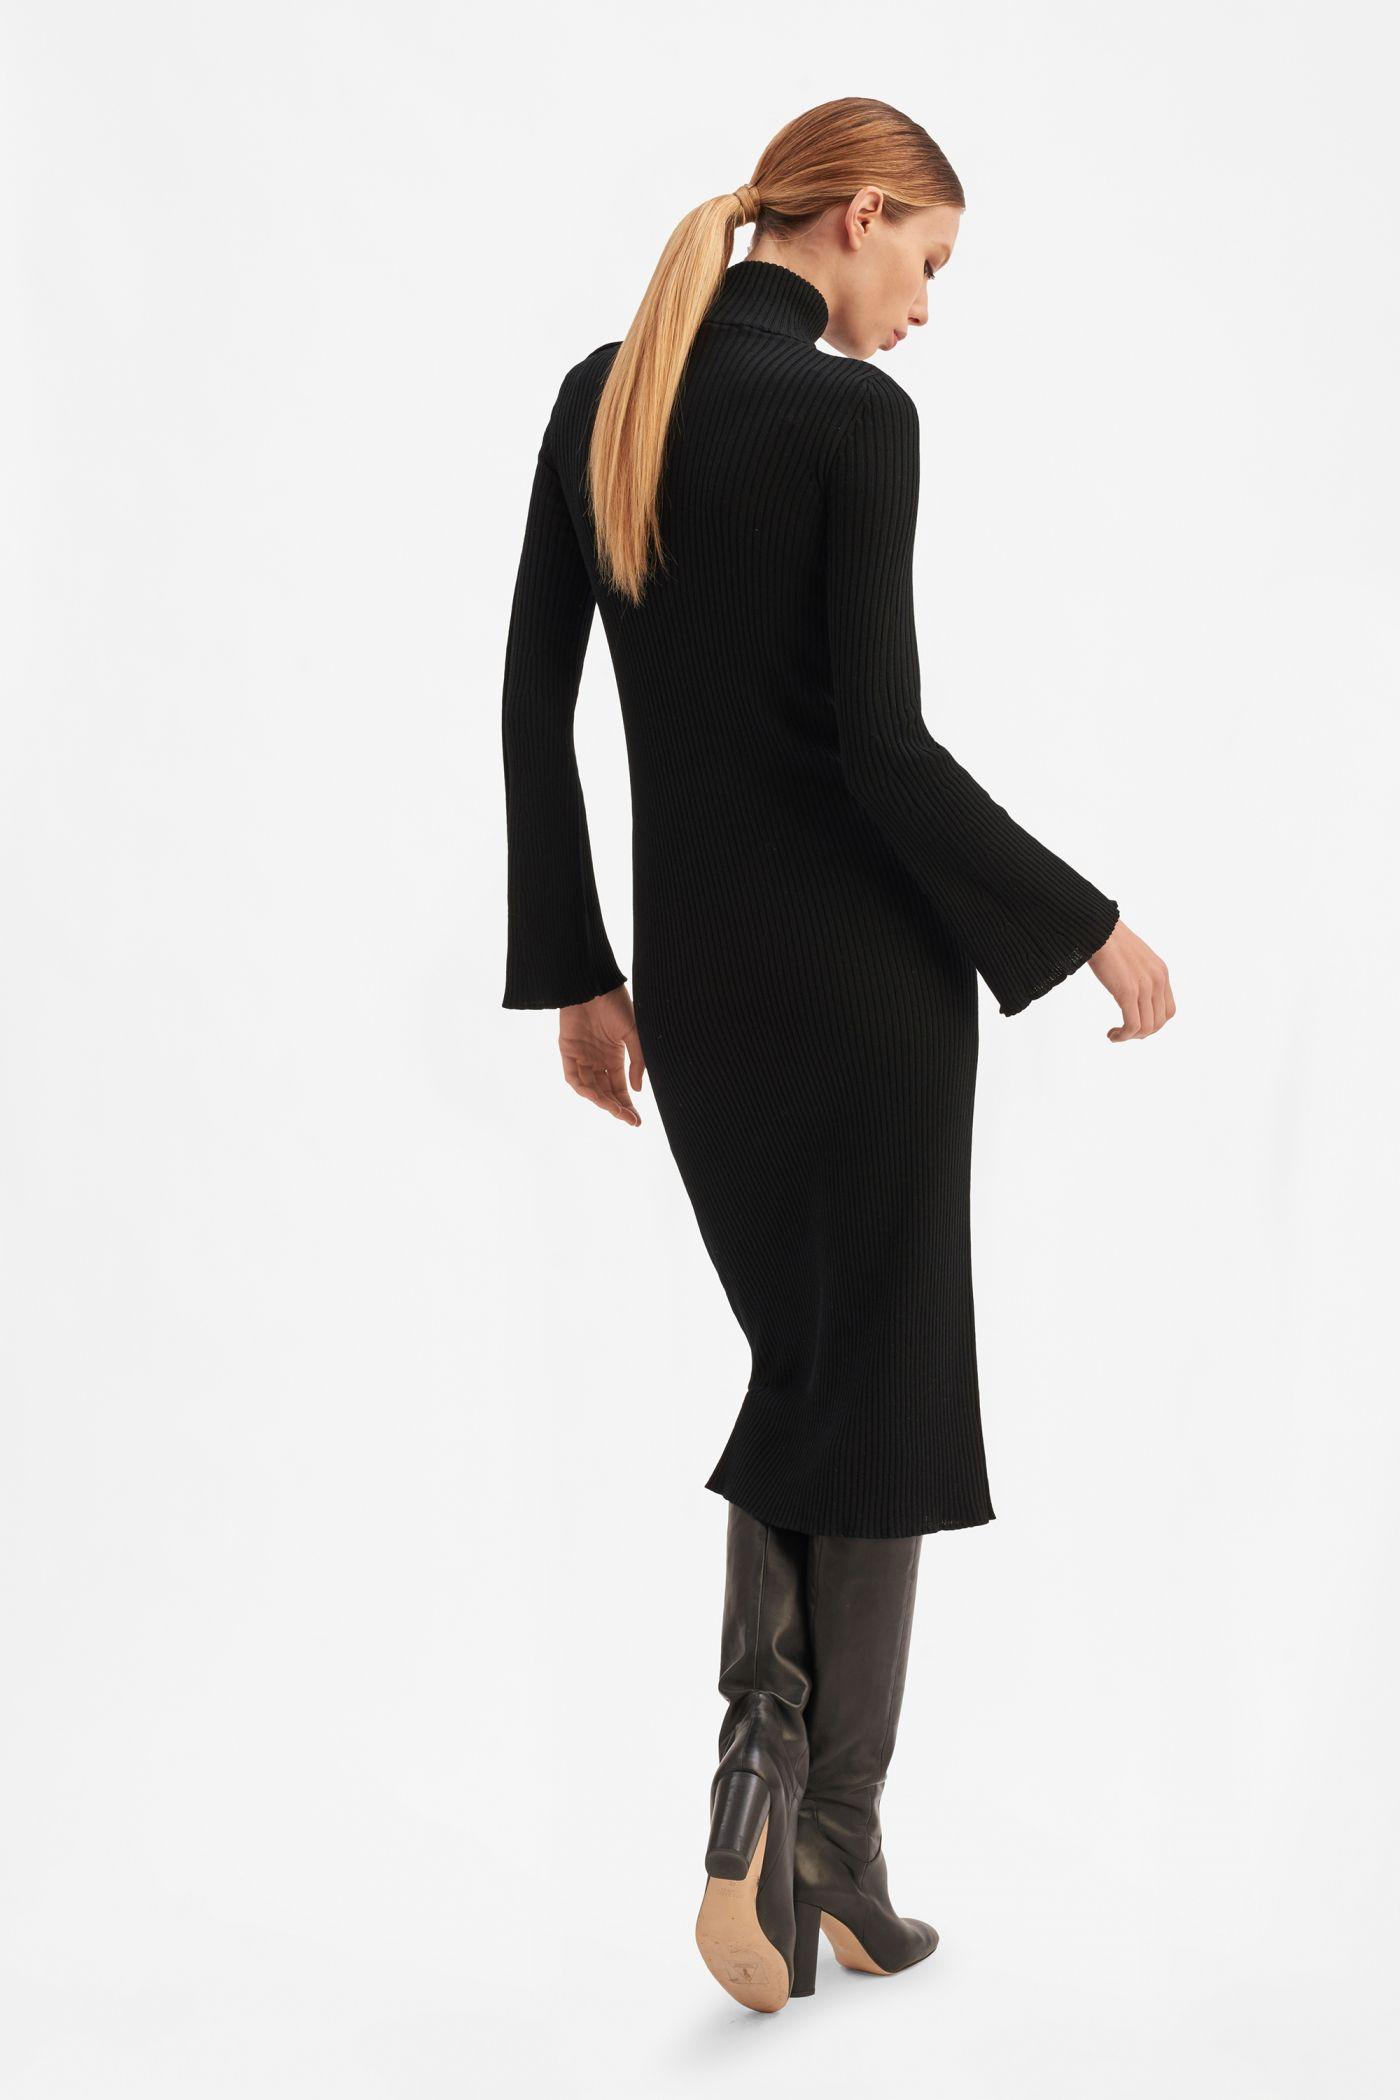 MISTICO DRESS 101 3